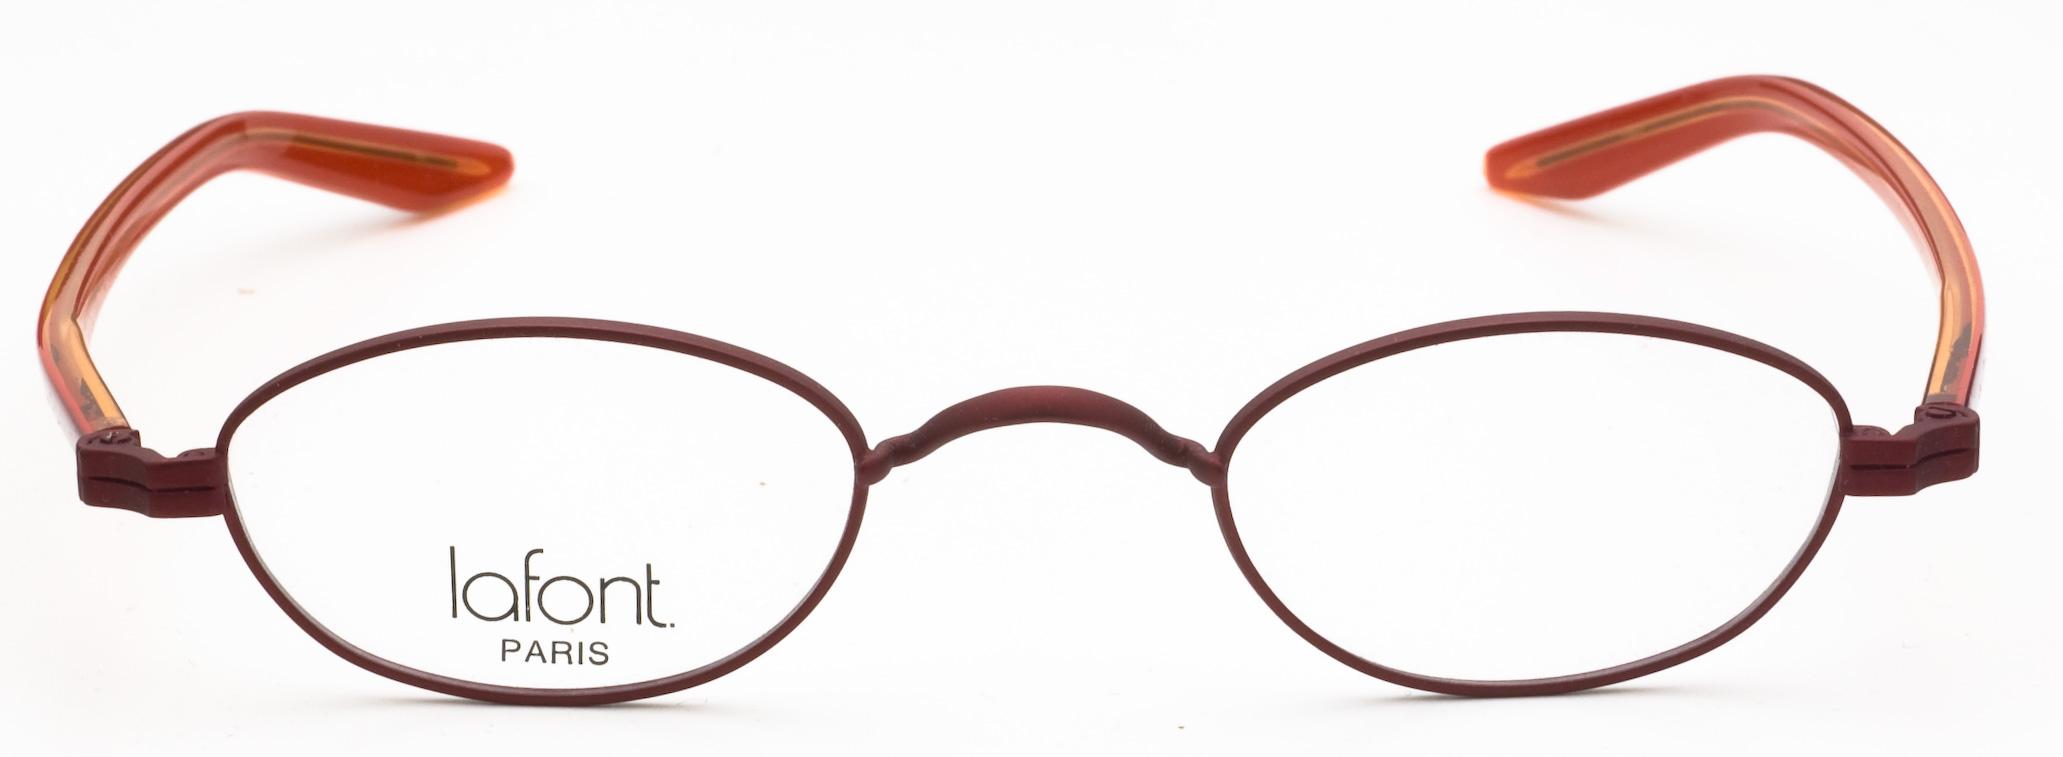 Lafont Sun Glasses Eye Glasses Oakley Sun Glasses